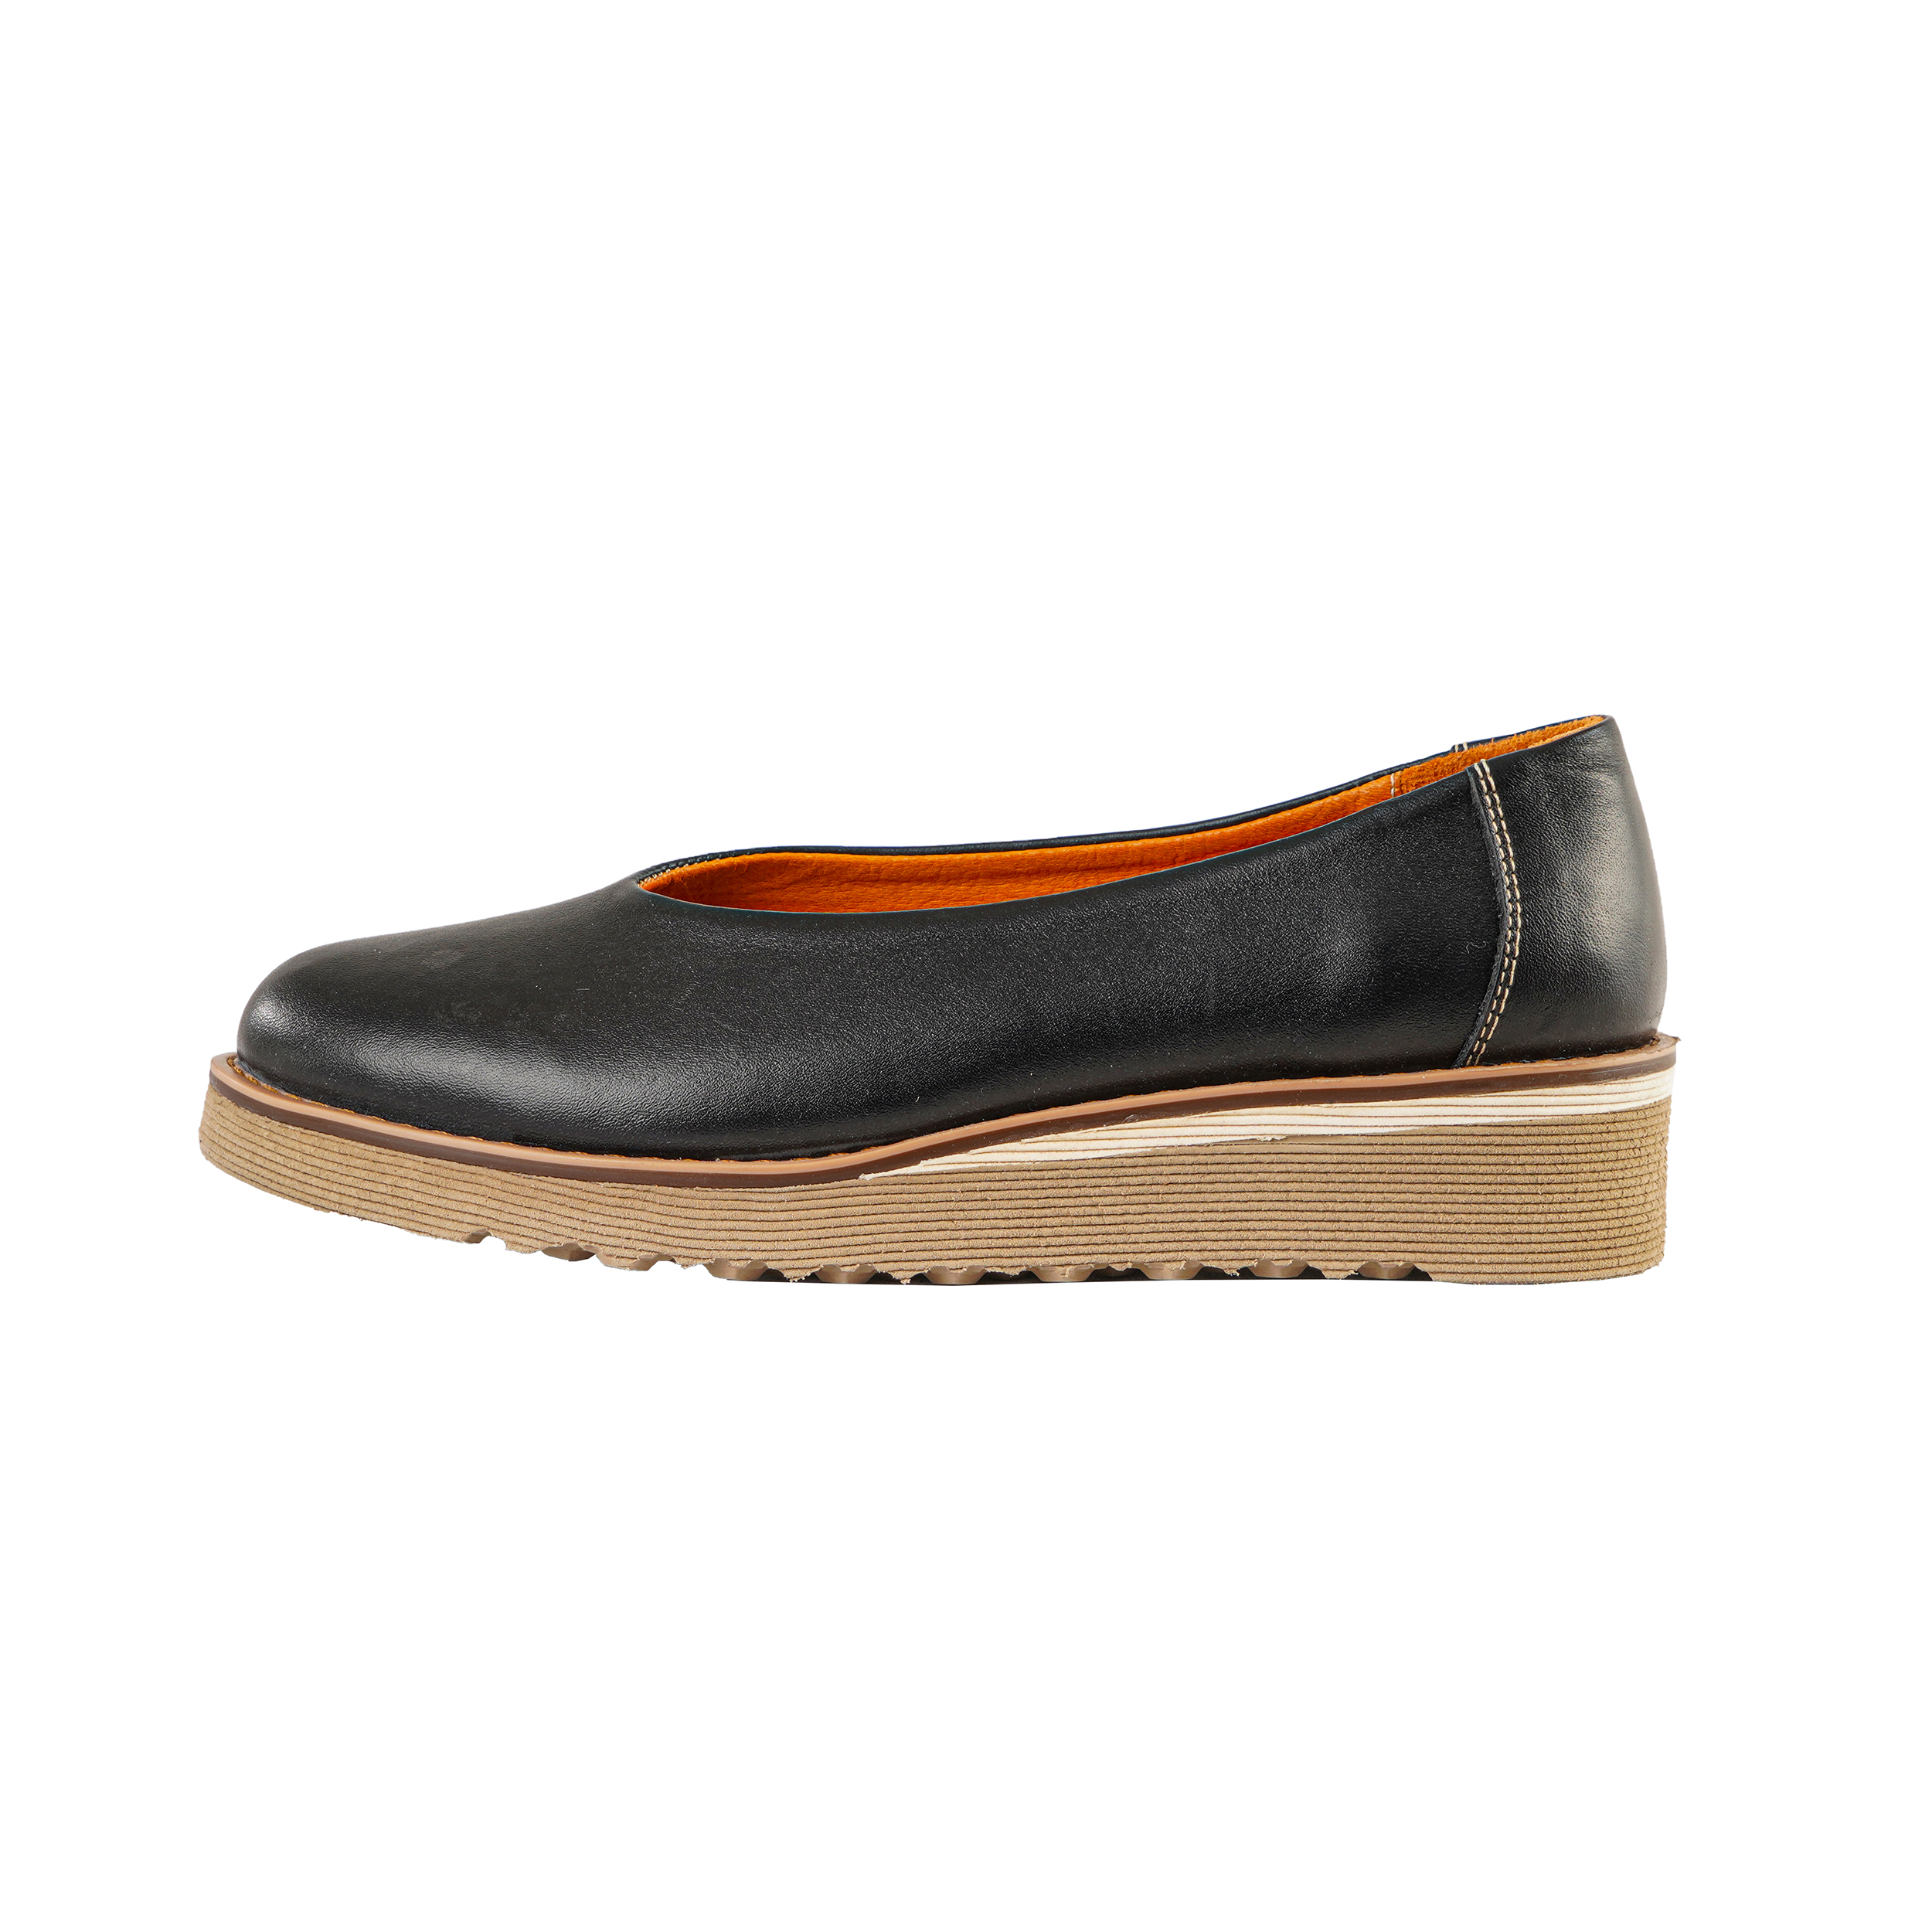 کفش روزمره زنانه صاد کد PP0901